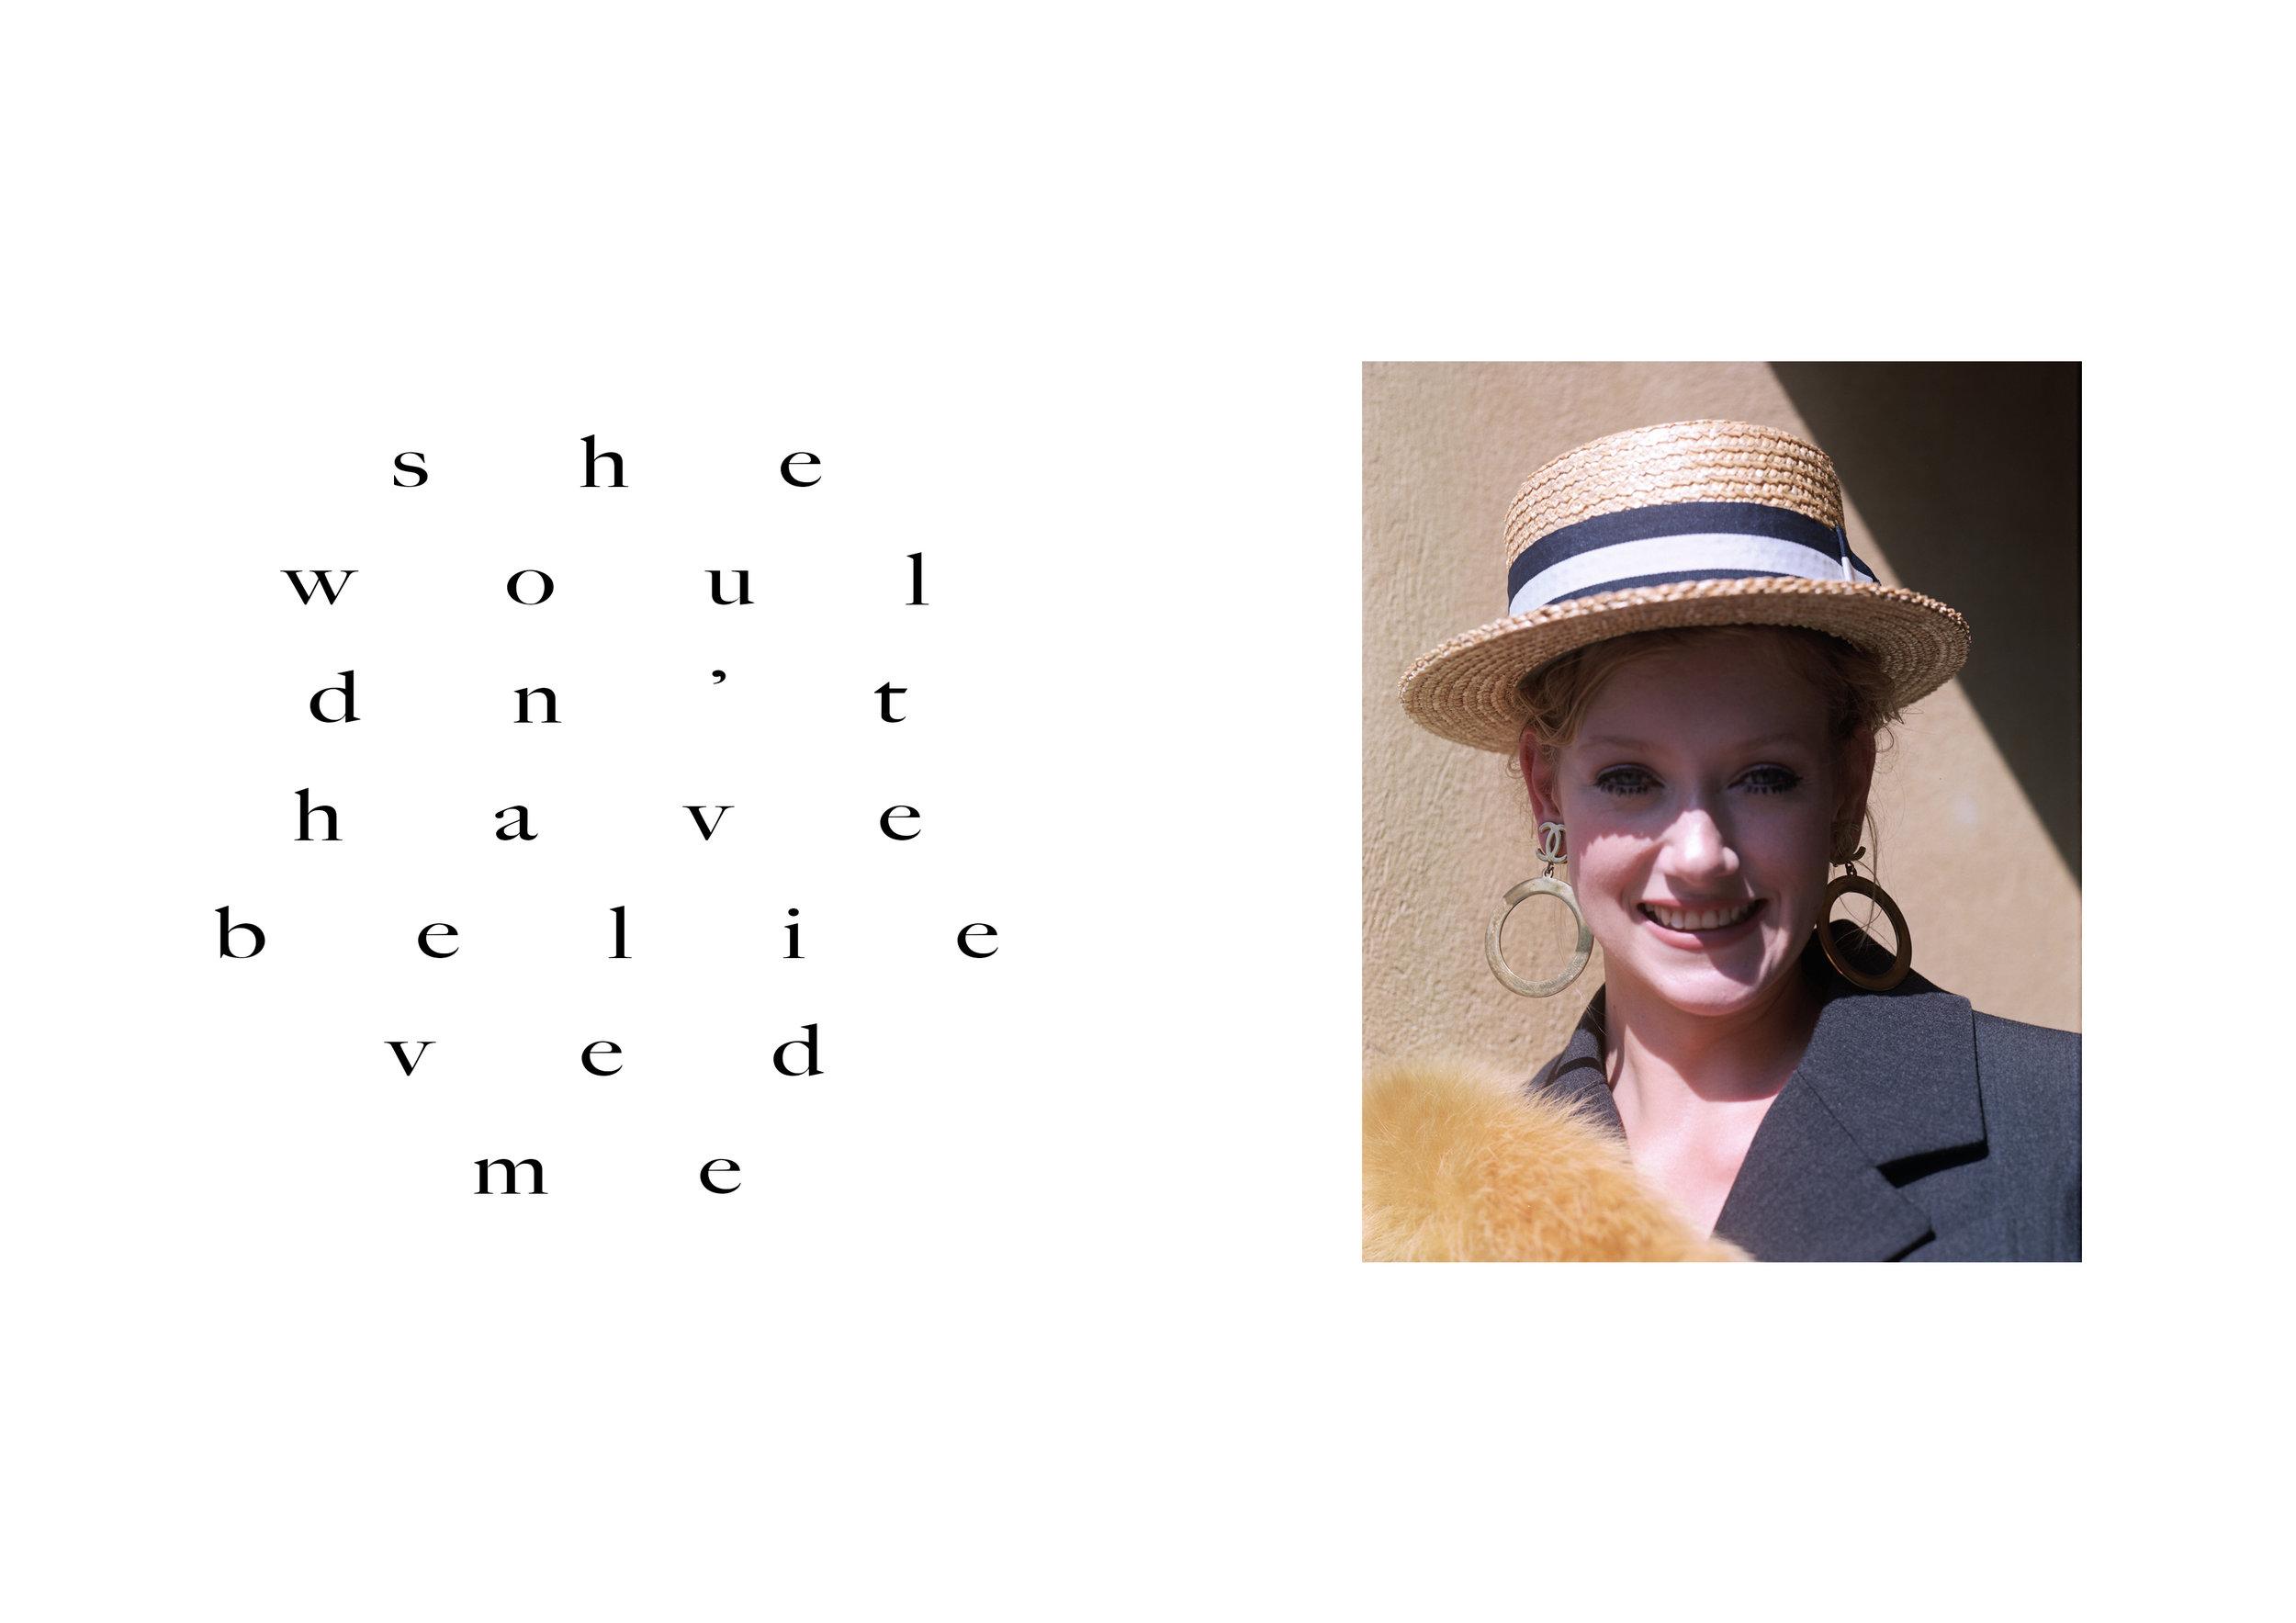 hat CHANEL, earrings CHANEL / AU VINTAGE, suit CHANEL, fur MIU MIU